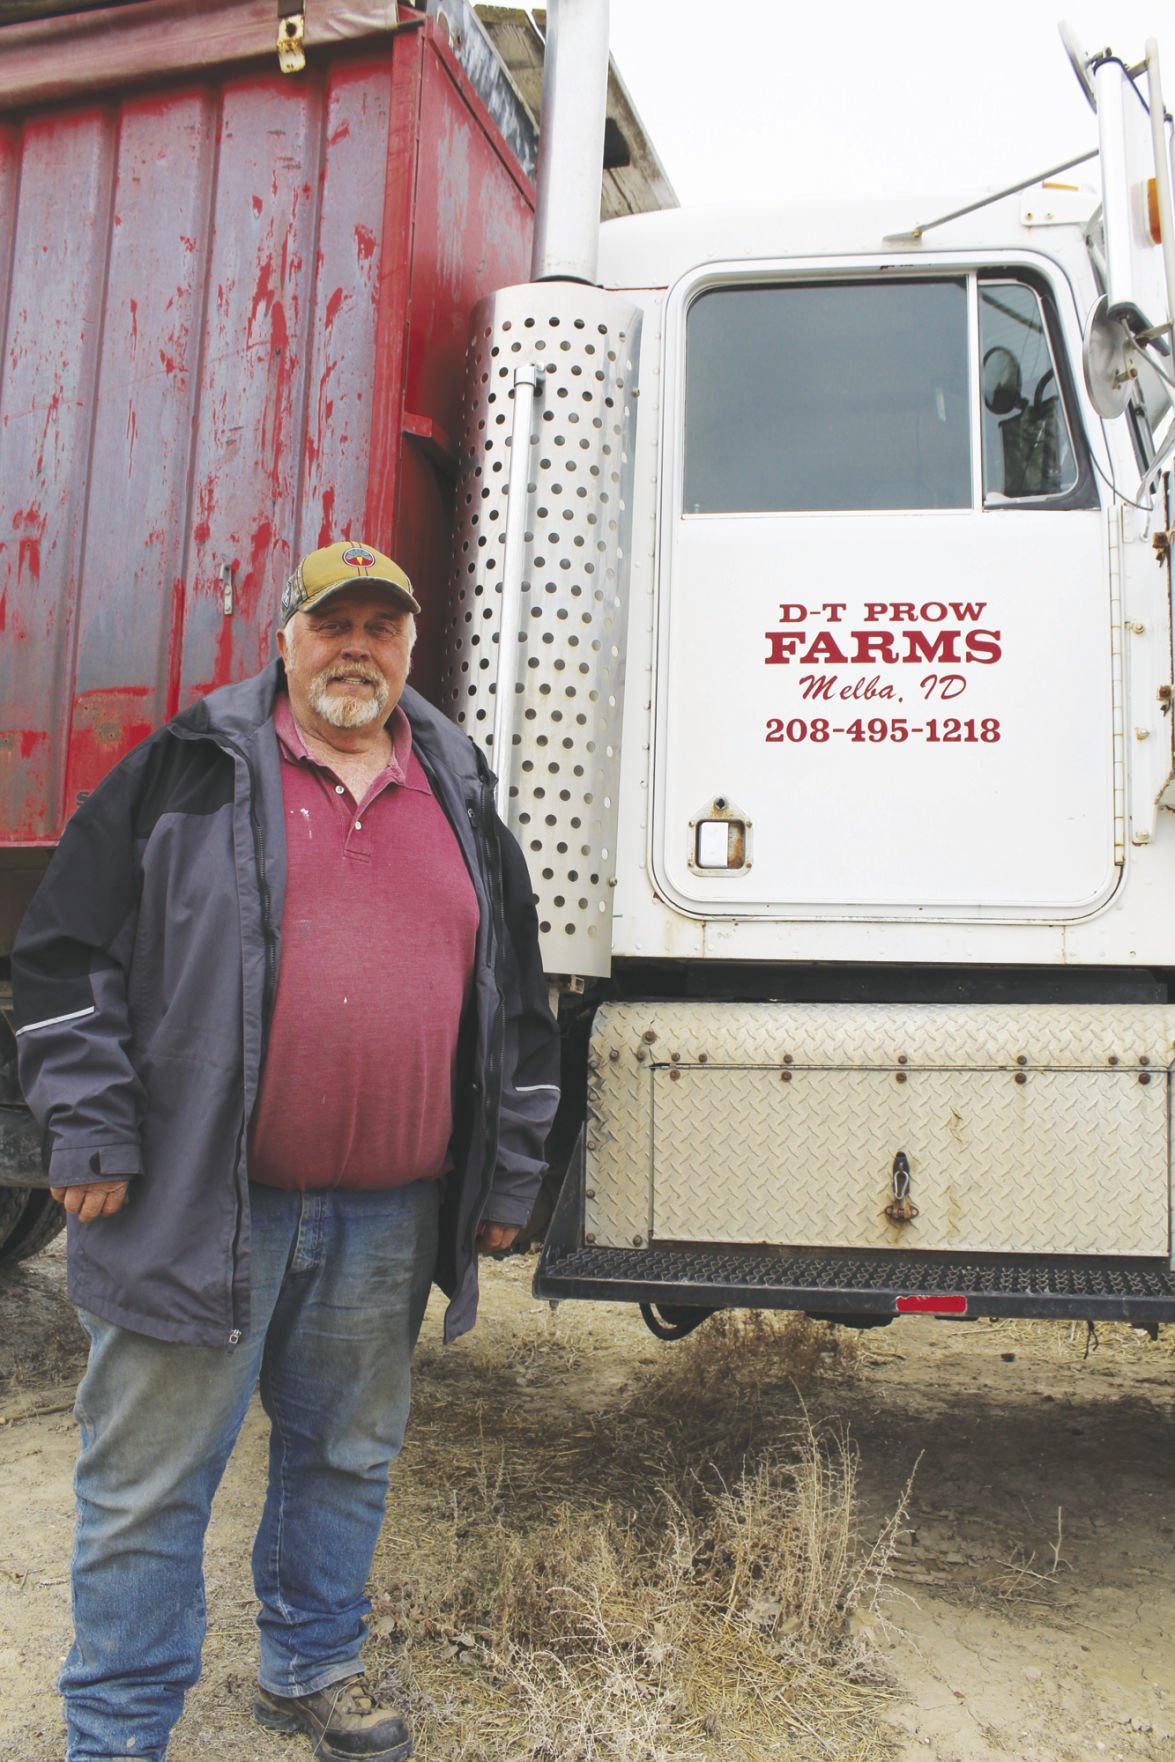 Melba farmer Dave Prow